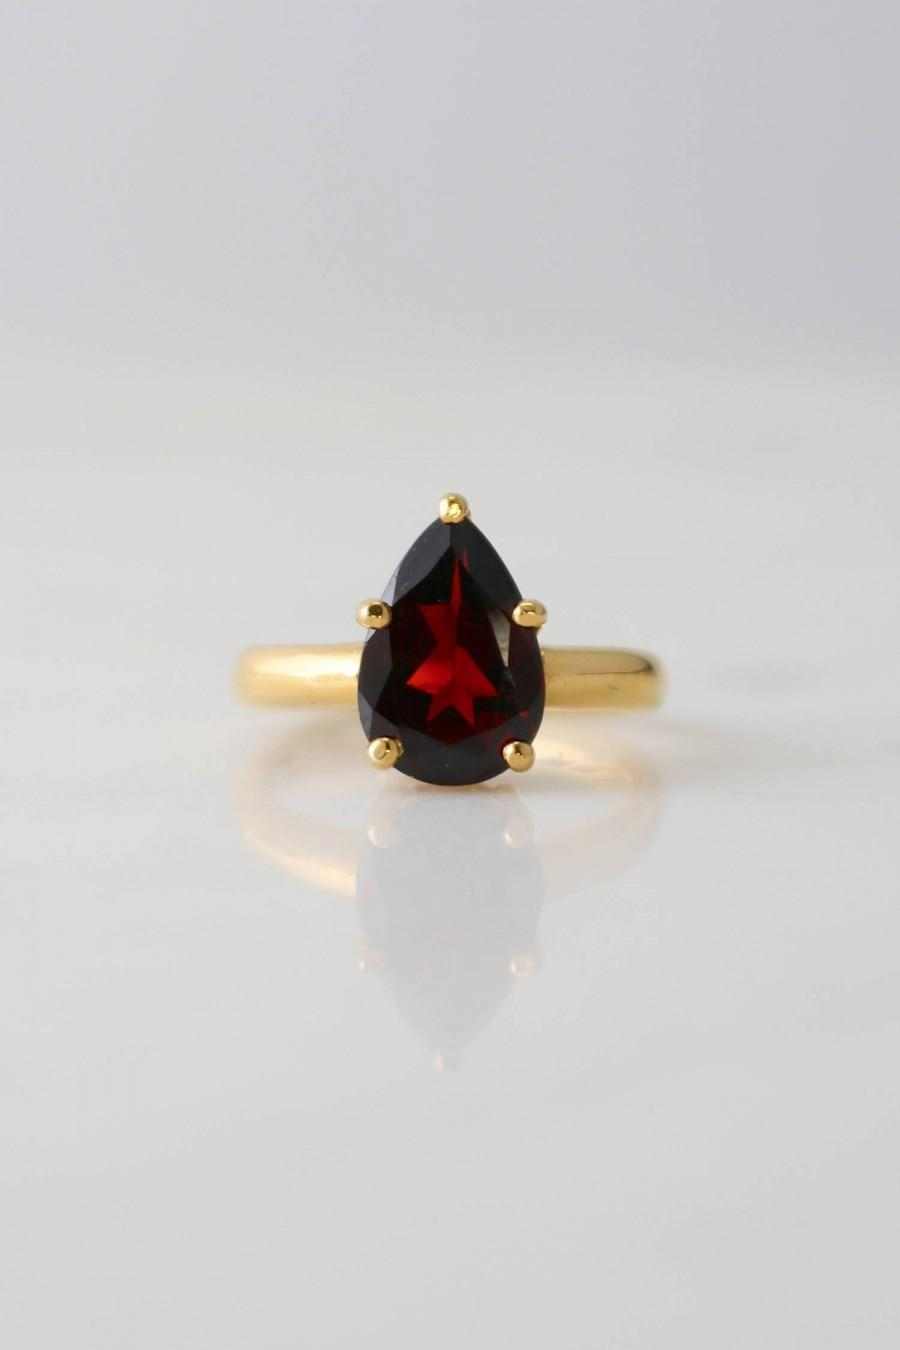 زفاف - January Birthstone Ring, Garnet gemstone ring, Pear Shaped, Engagement Ring, Vermeil Ring, Tear Drop Shape, Prongs ring, Custom made ring